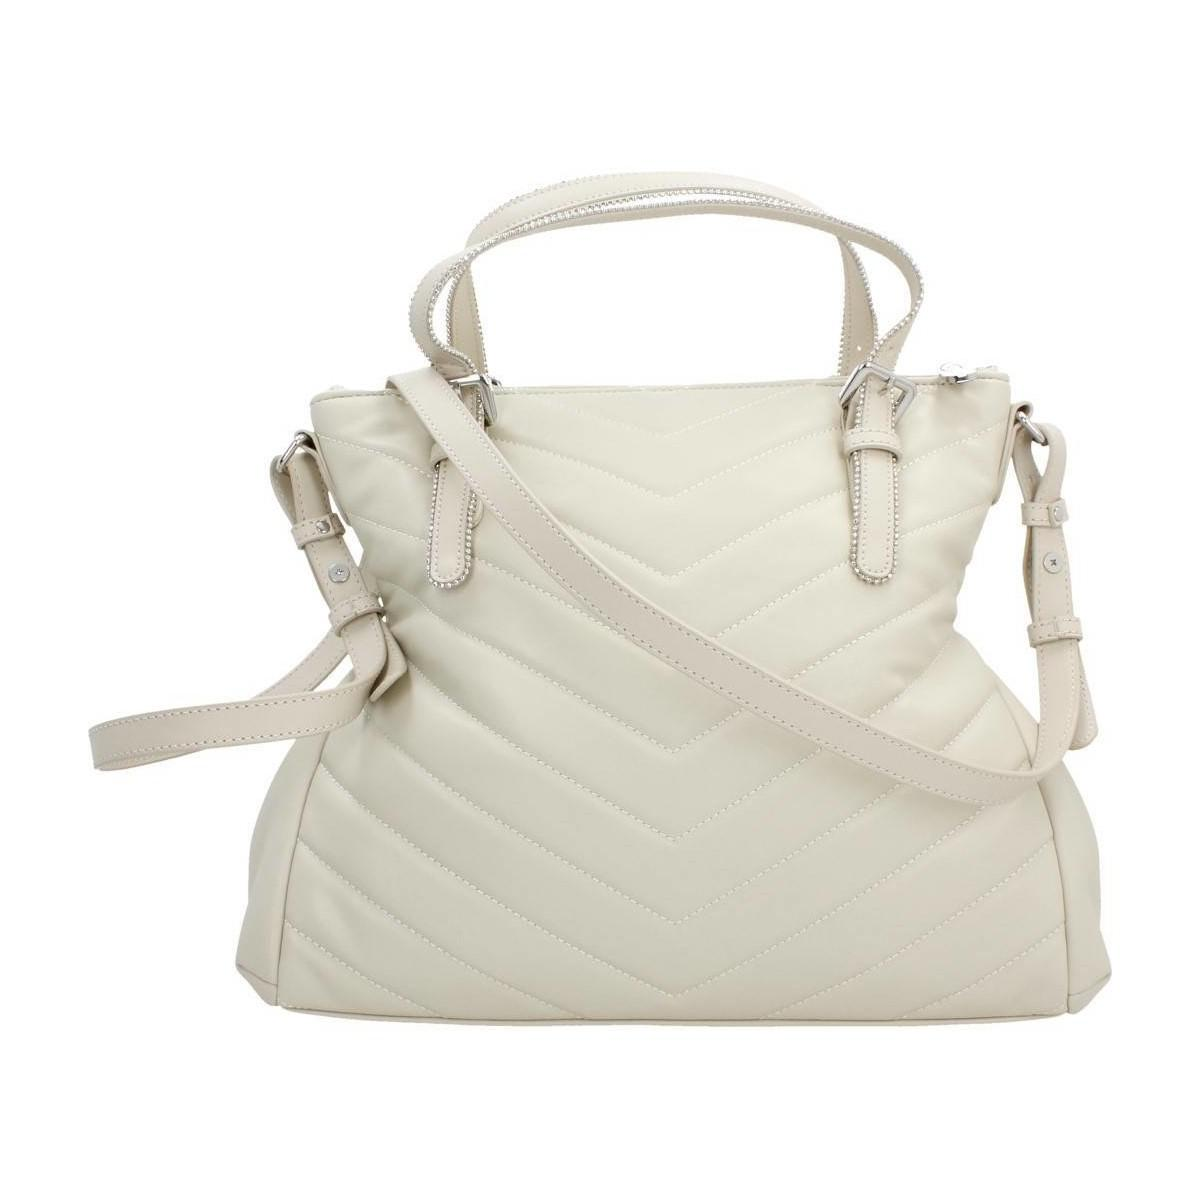 Armani Jeans Borsa Shopping Giord Women's Shopper Bag In Beige in ... 0ecb39b5b89a